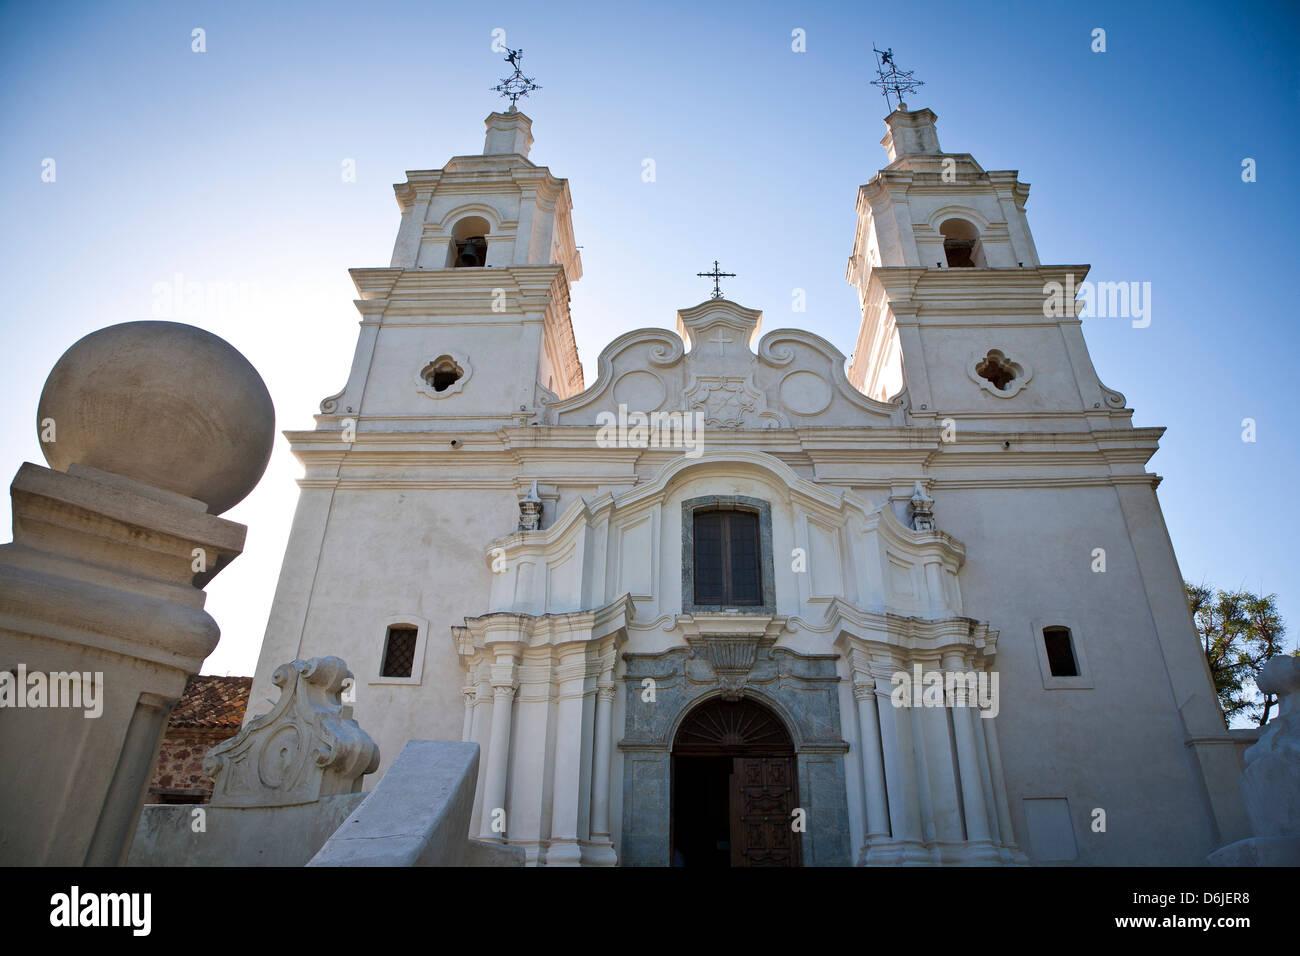 Santa Catalina Jesuit Estancia, UNESCO World Heritage Site, Cordoba Province, Argentina, South America - Stock Image